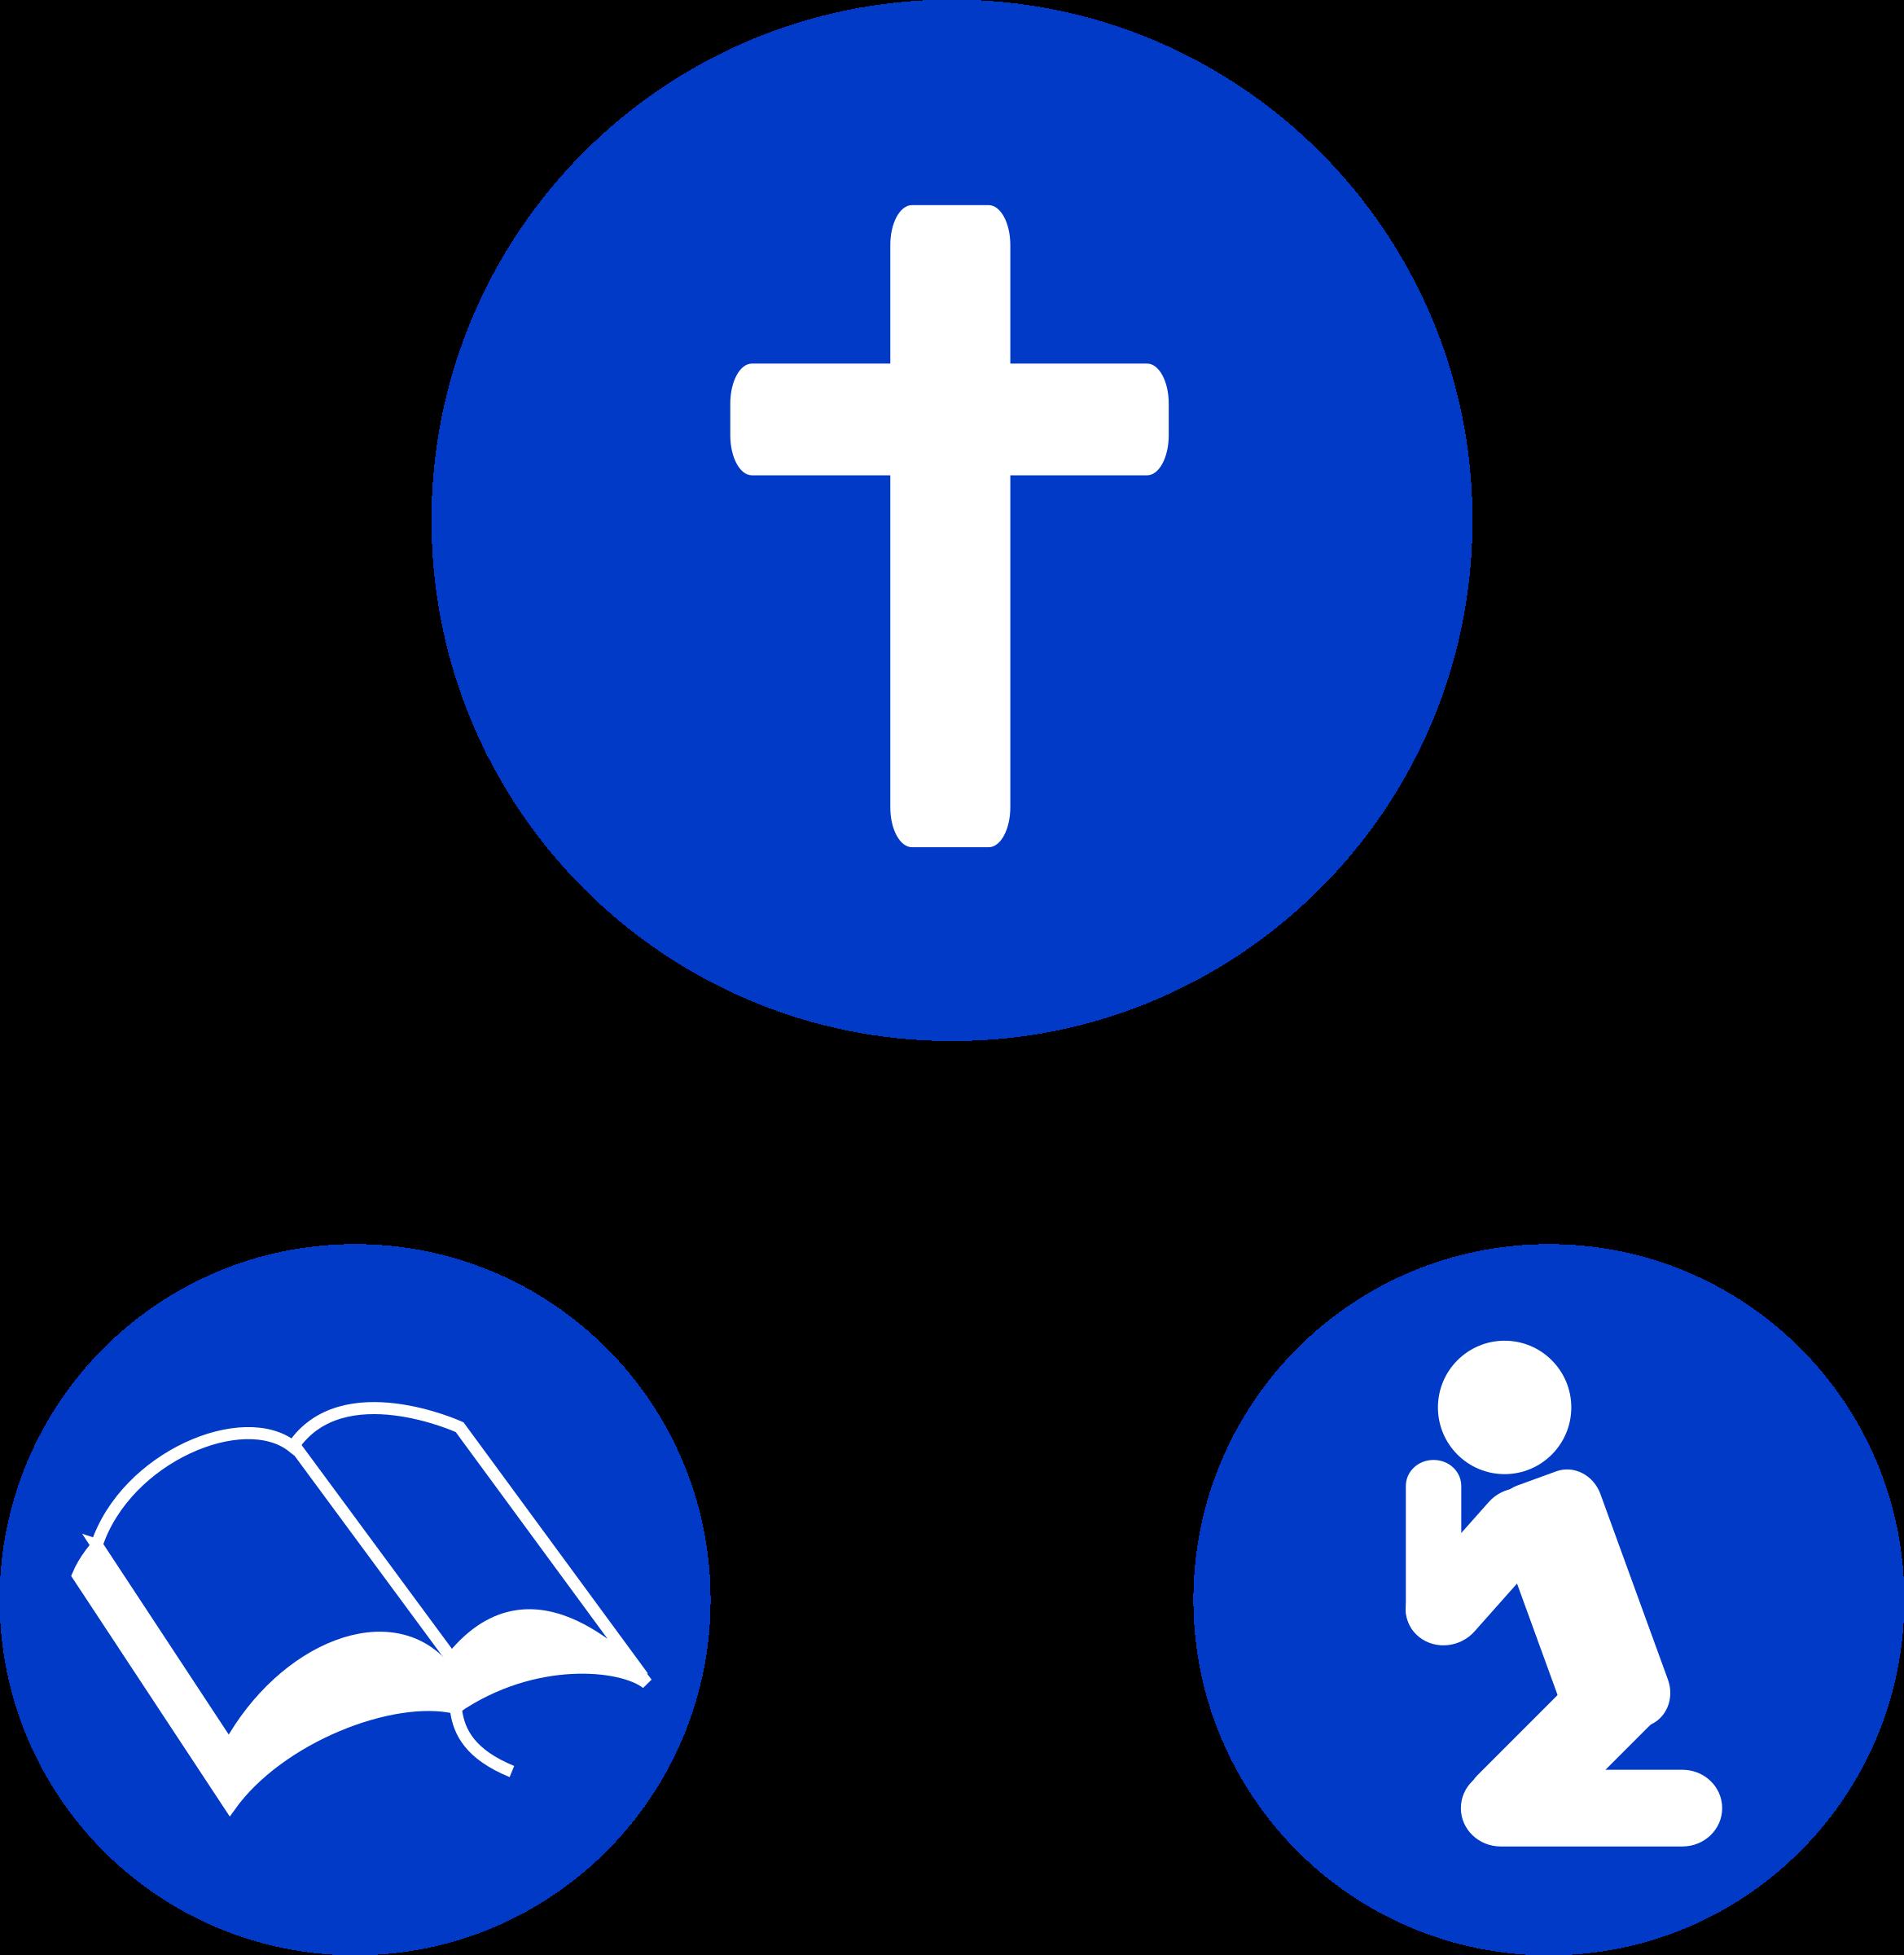 Teamwork clipart blue. Christian life saving rules